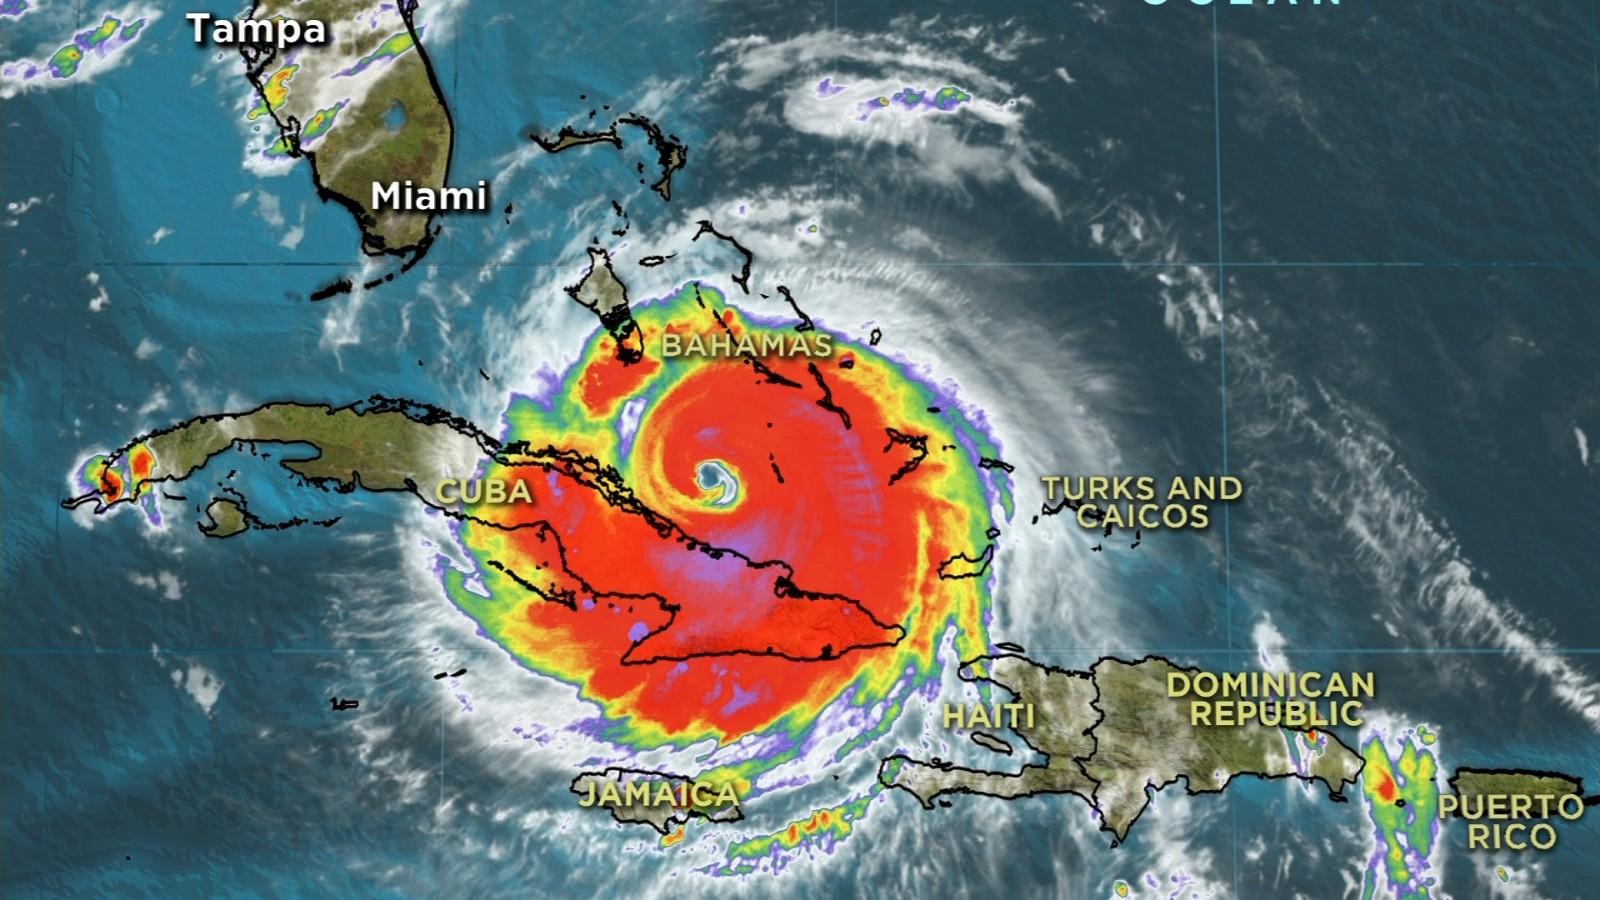 Hurricane Irma approaching Florida in 2017.